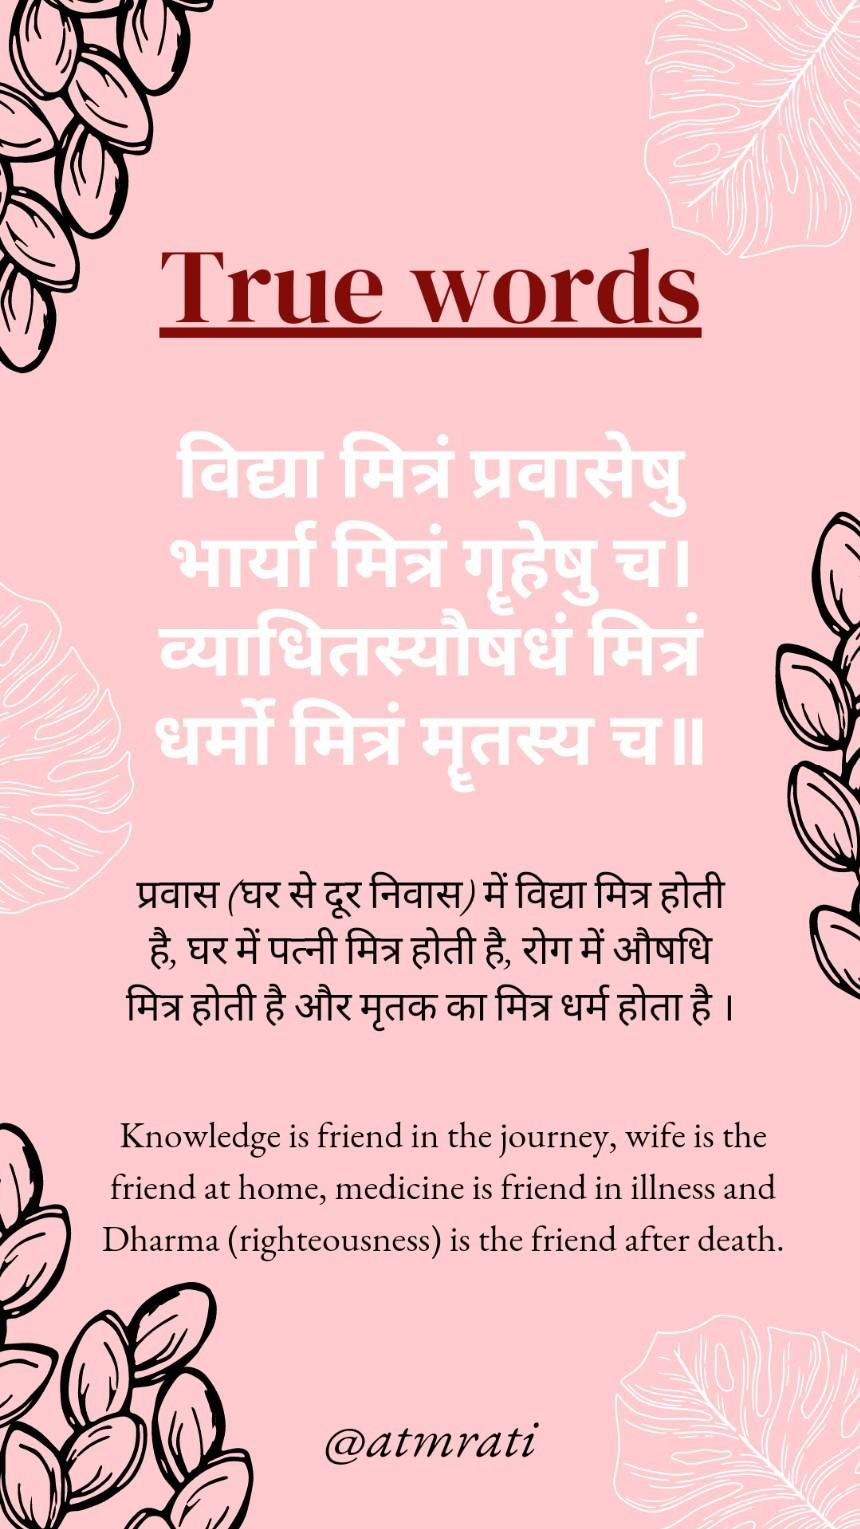 true words . sanskrit. inspirational quotes. spiritual. graphic design poster . faith quotes. life.